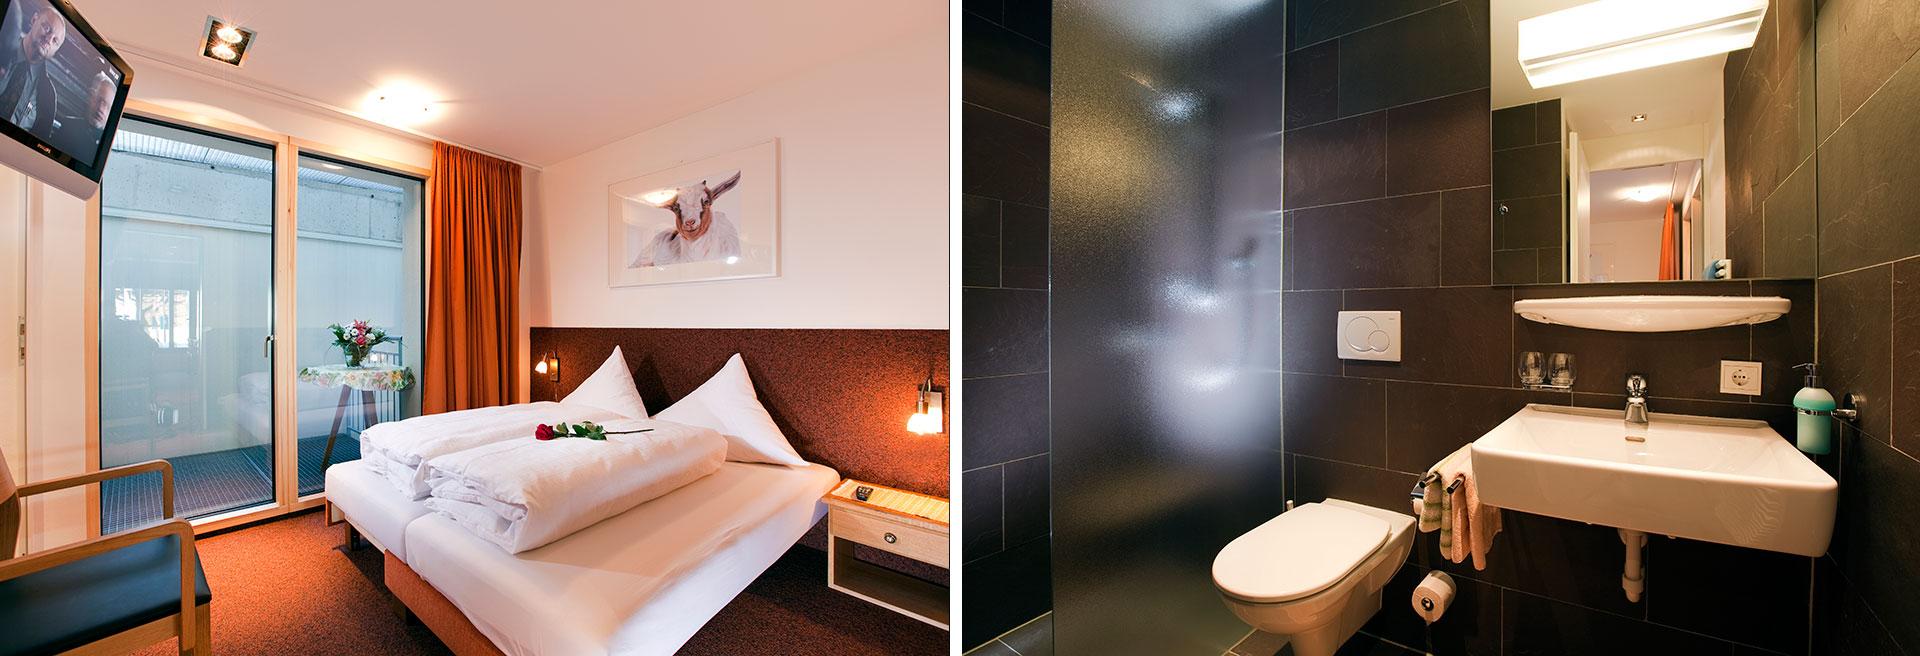 Hotel Garni Pfeifer Ischgl